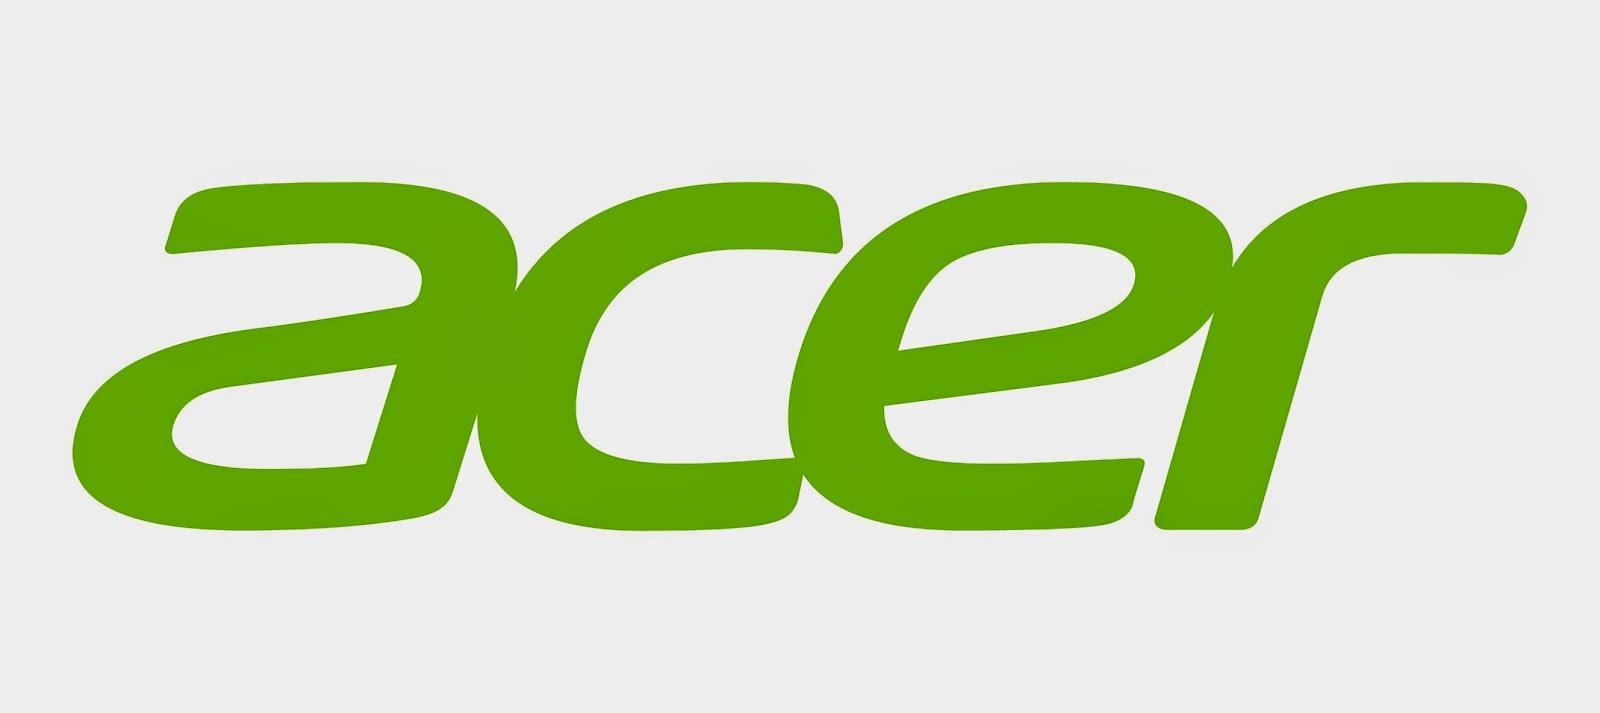 Daftar Harga Lengkap Laptop Acer Oktober 2014